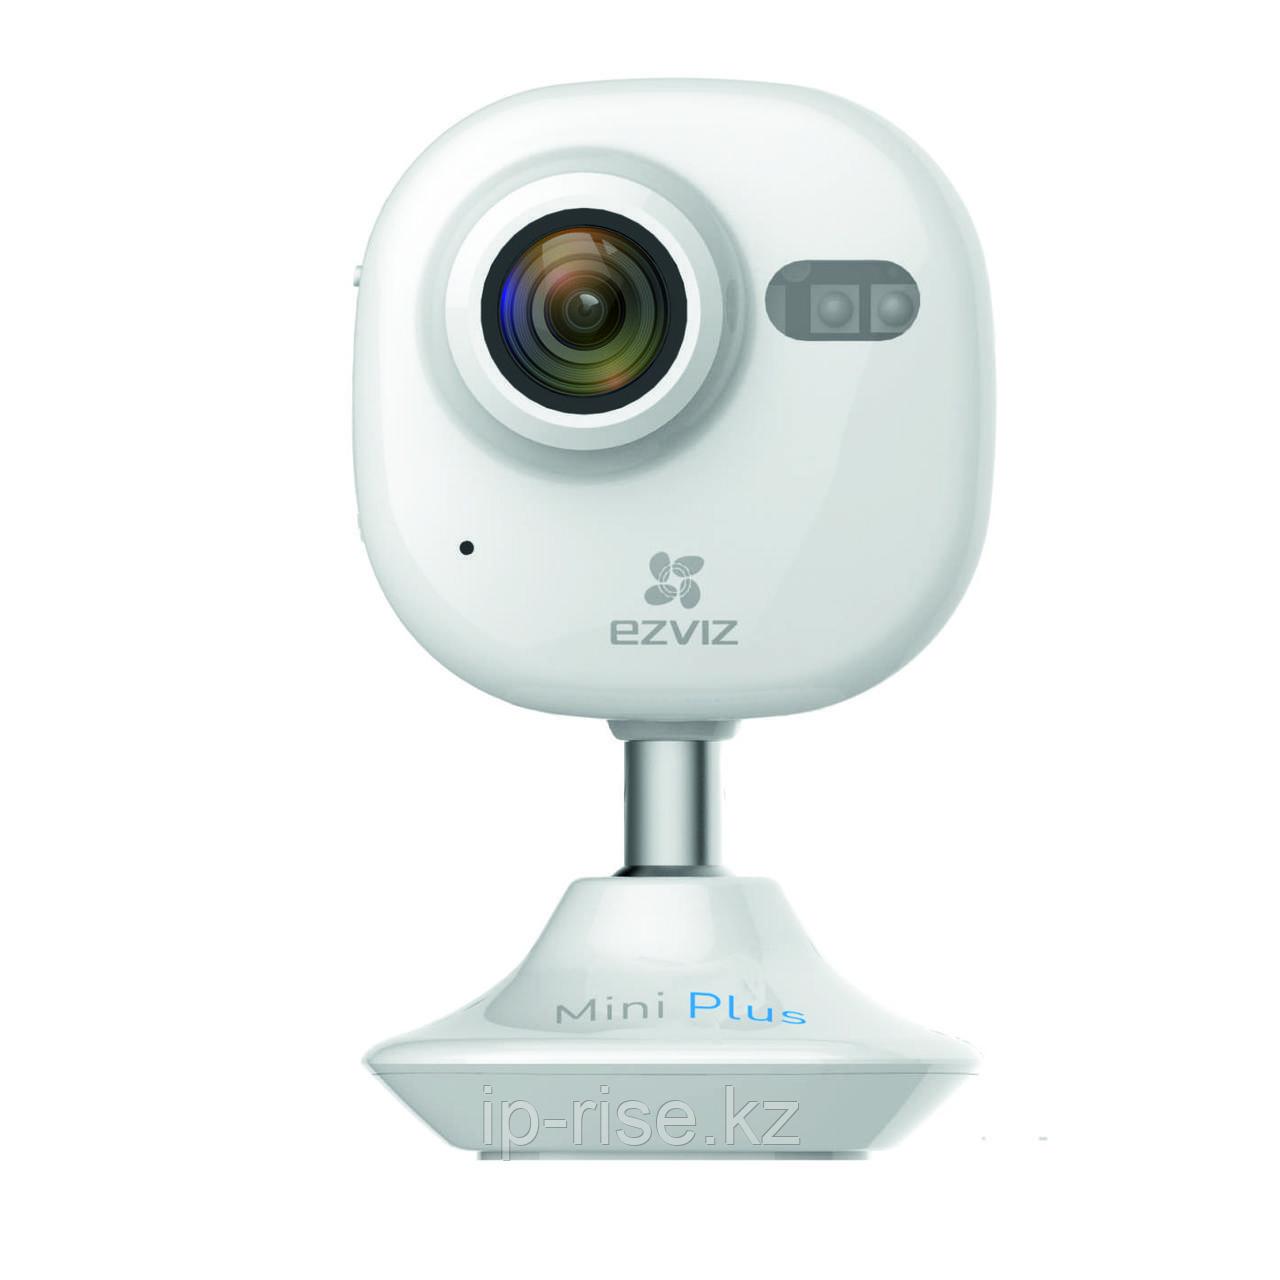 Mini Plus, EZVIZ видеокамера